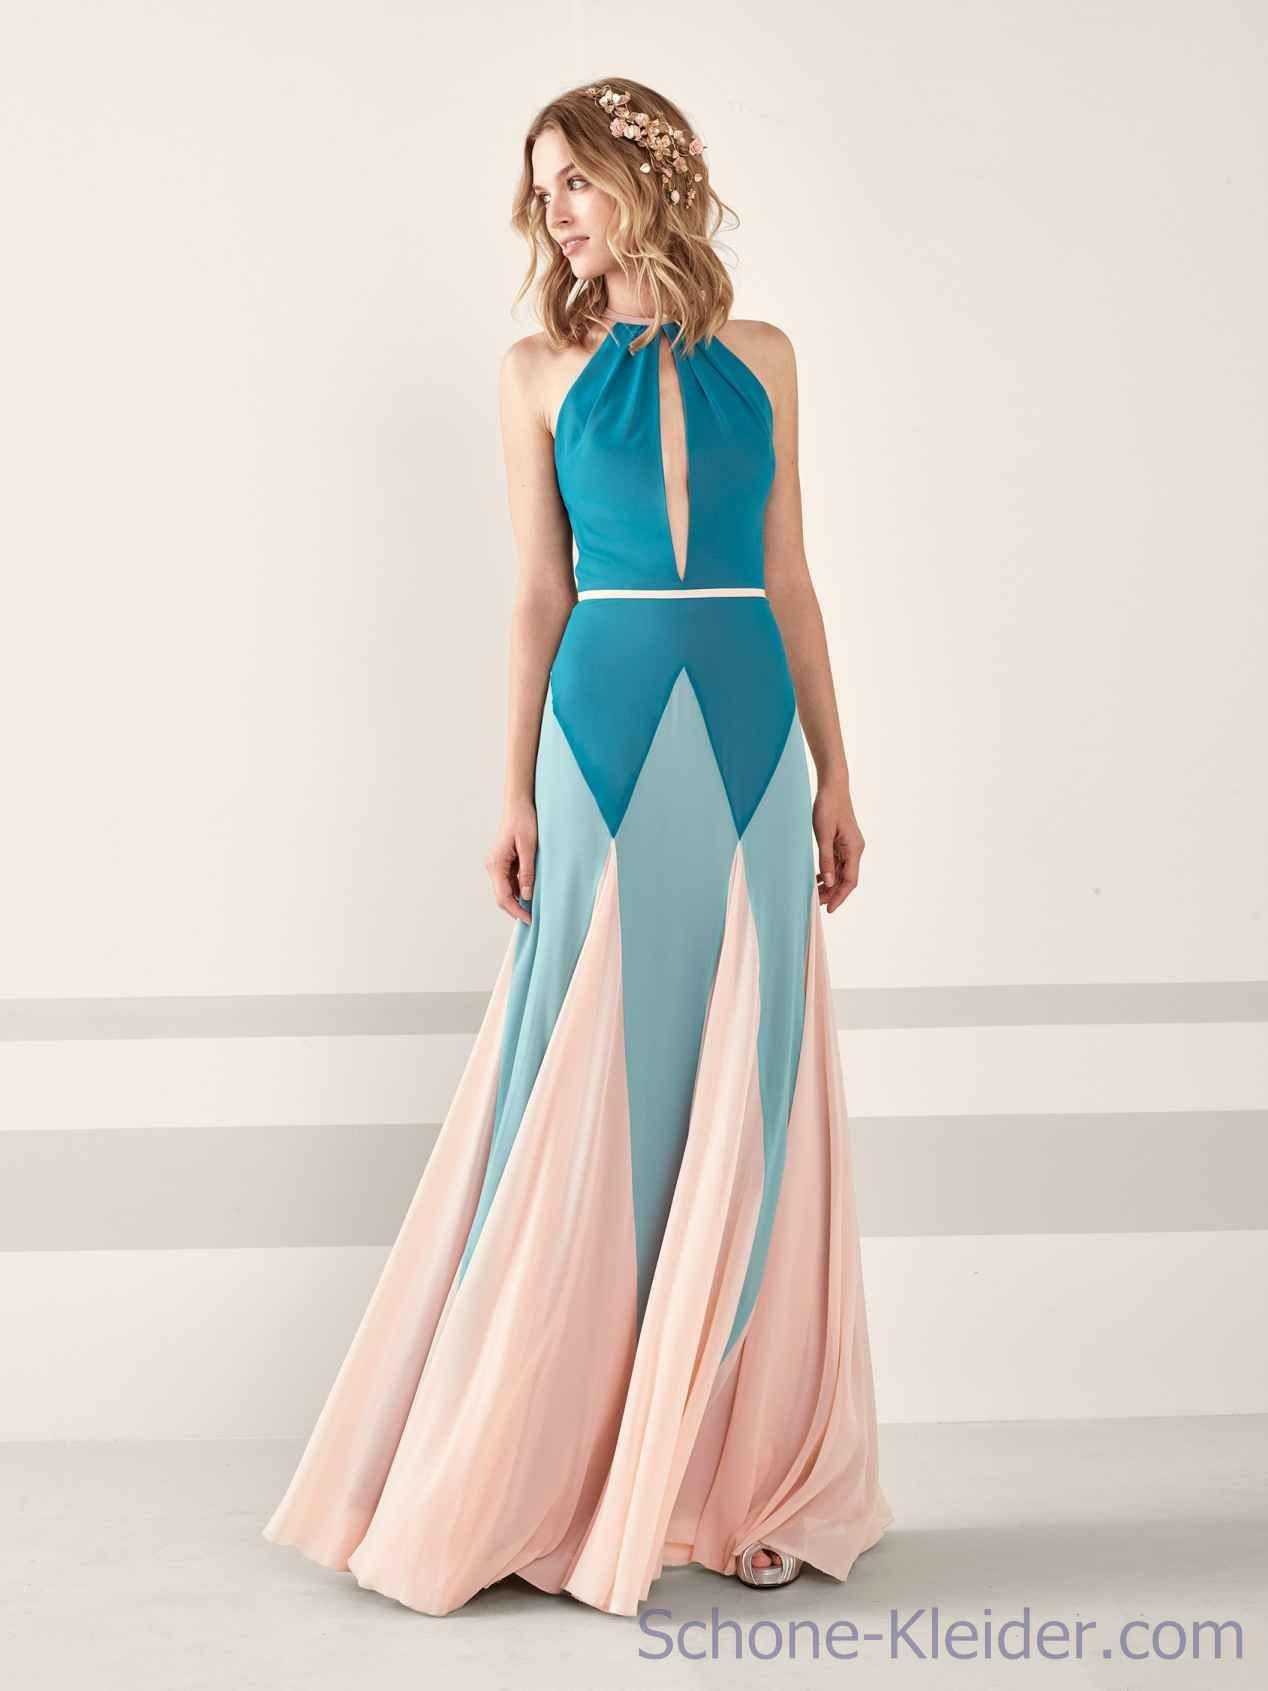 Formal Spektakulär Abendkleid Fair Bester Preis17 Elegant Abendkleid Fair Design